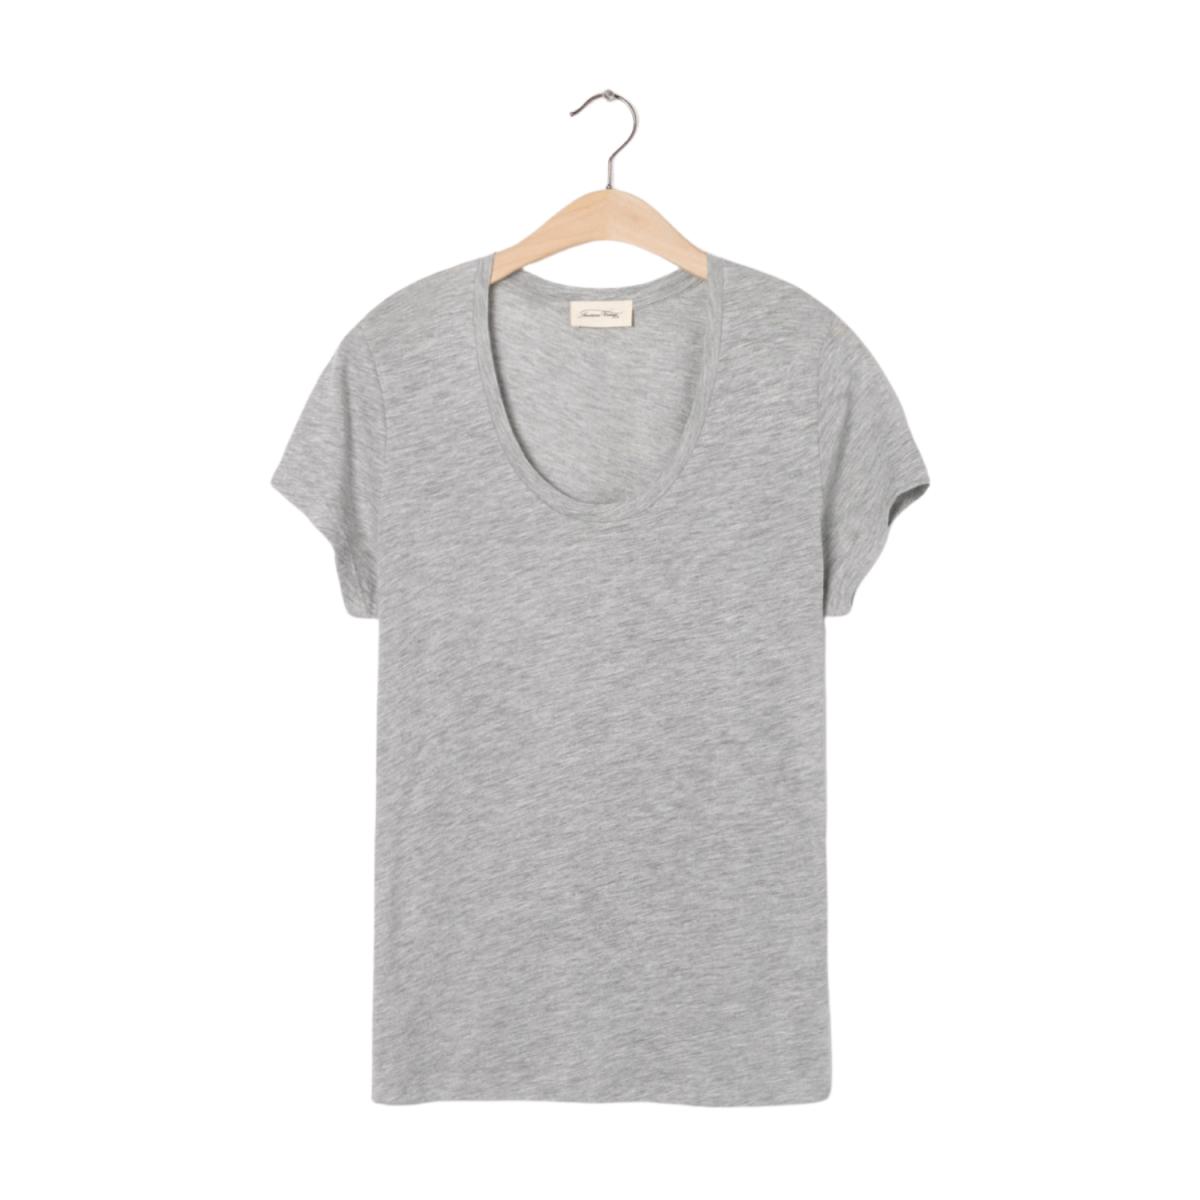 jacksonville t-shirt - heather grey